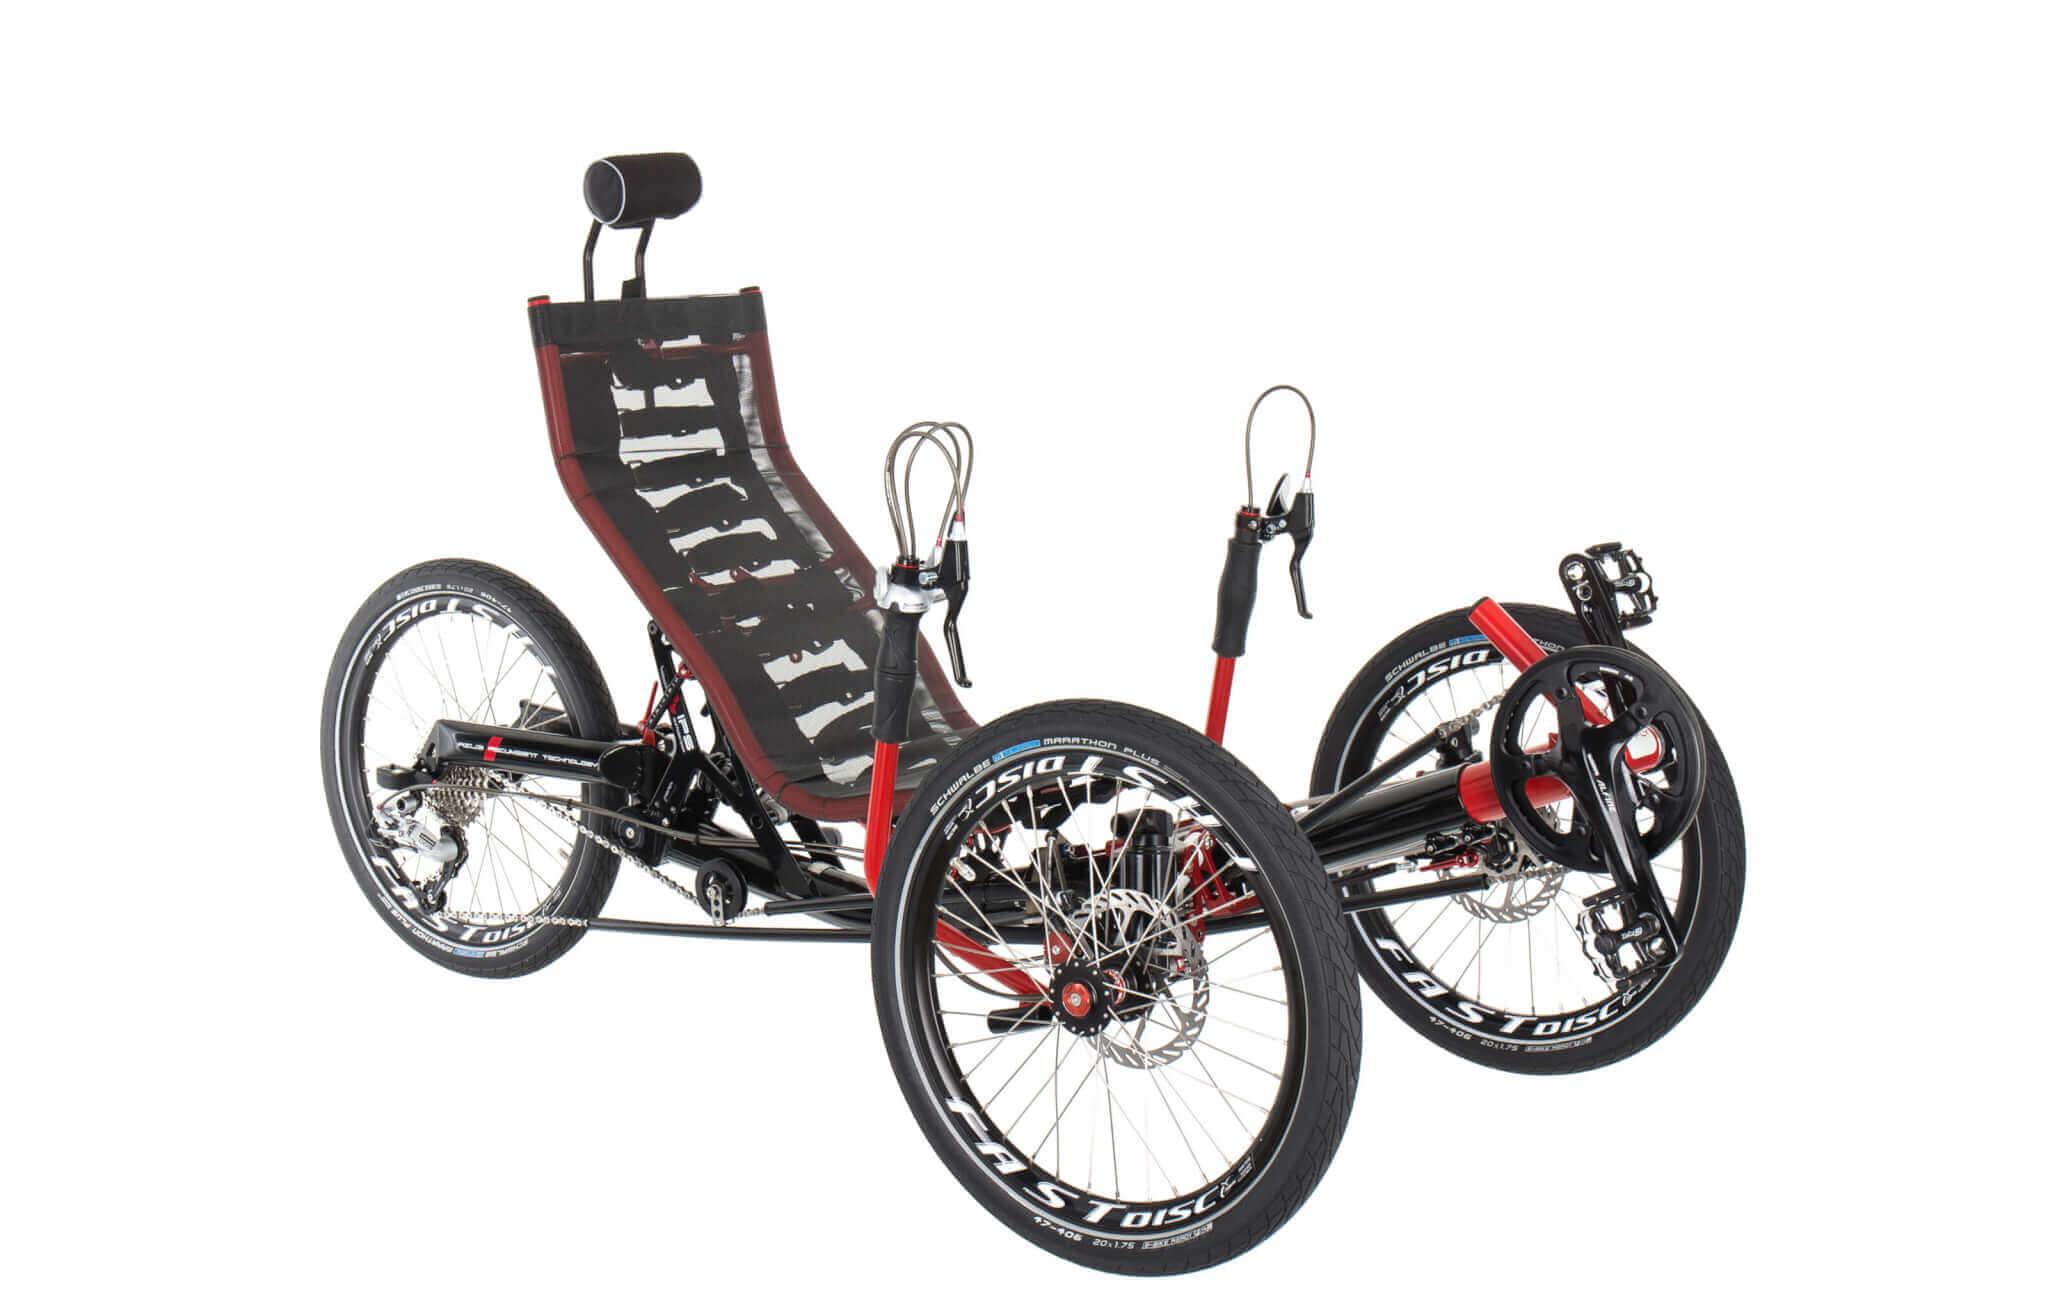 ti fly accessories 20 20 20 advanced recumbent trike. Black Bedroom Furniture Sets. Home Design Ideas